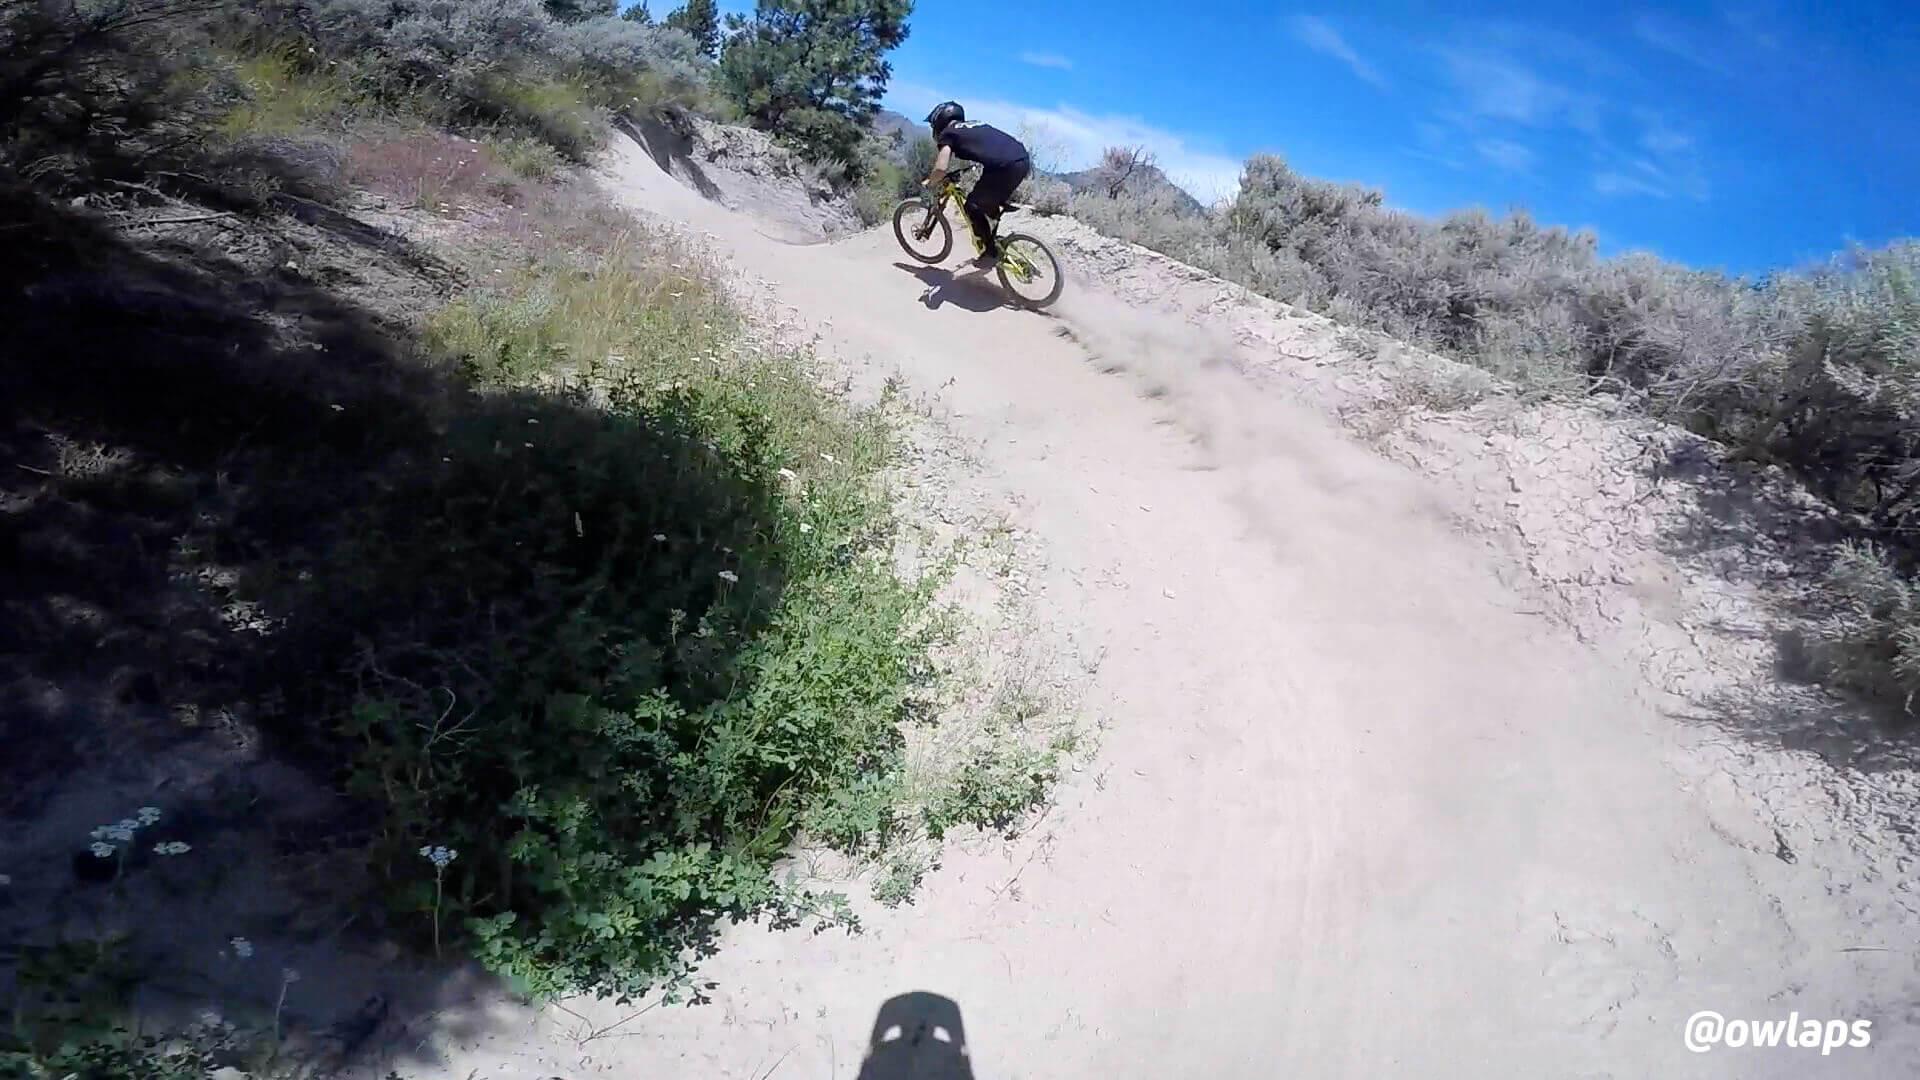 wrangler-kamloops-bike-ranch-canada-owlaps-HD-10